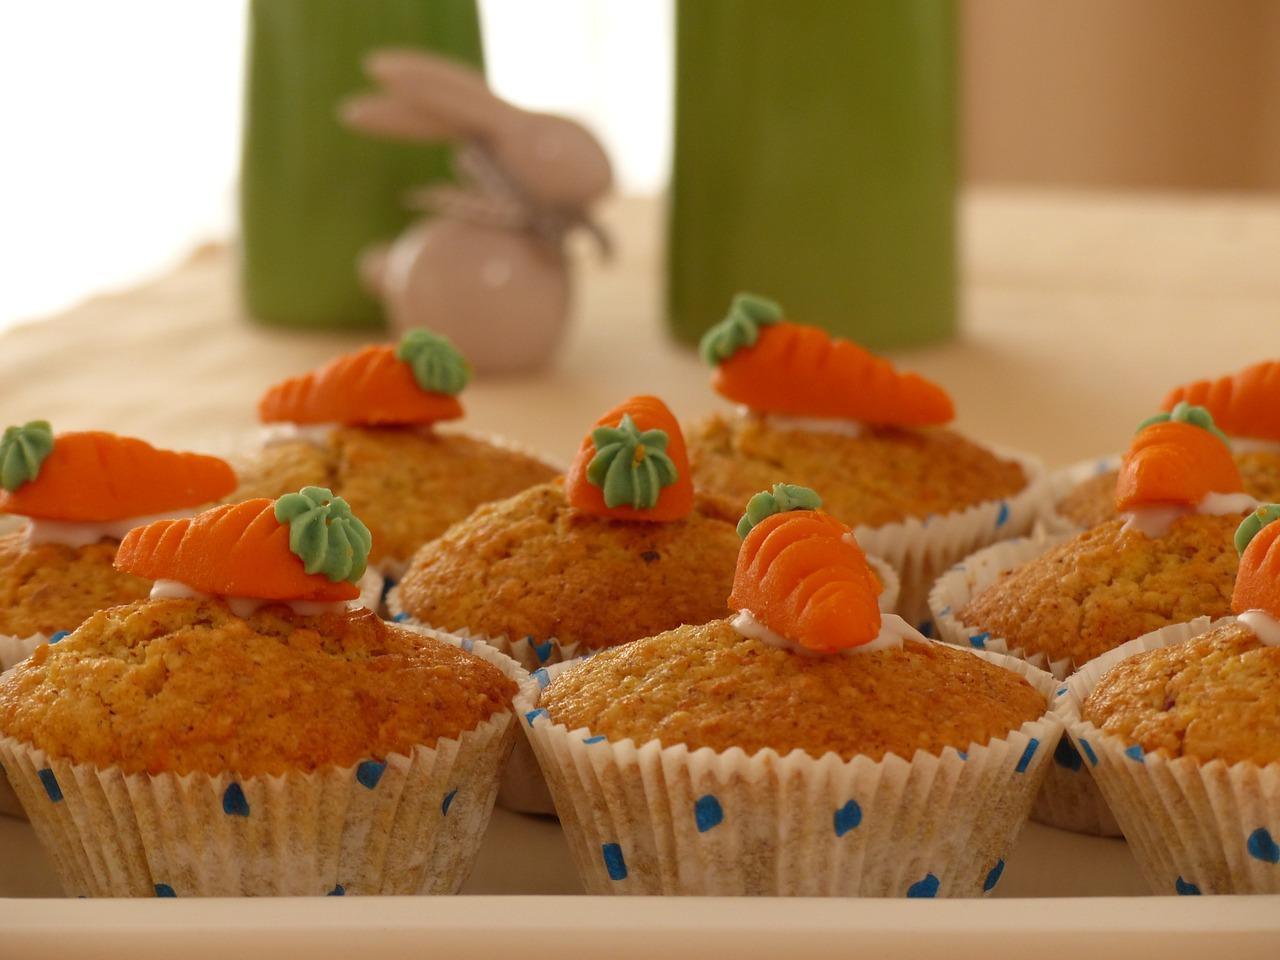 Carrot cakes pasen